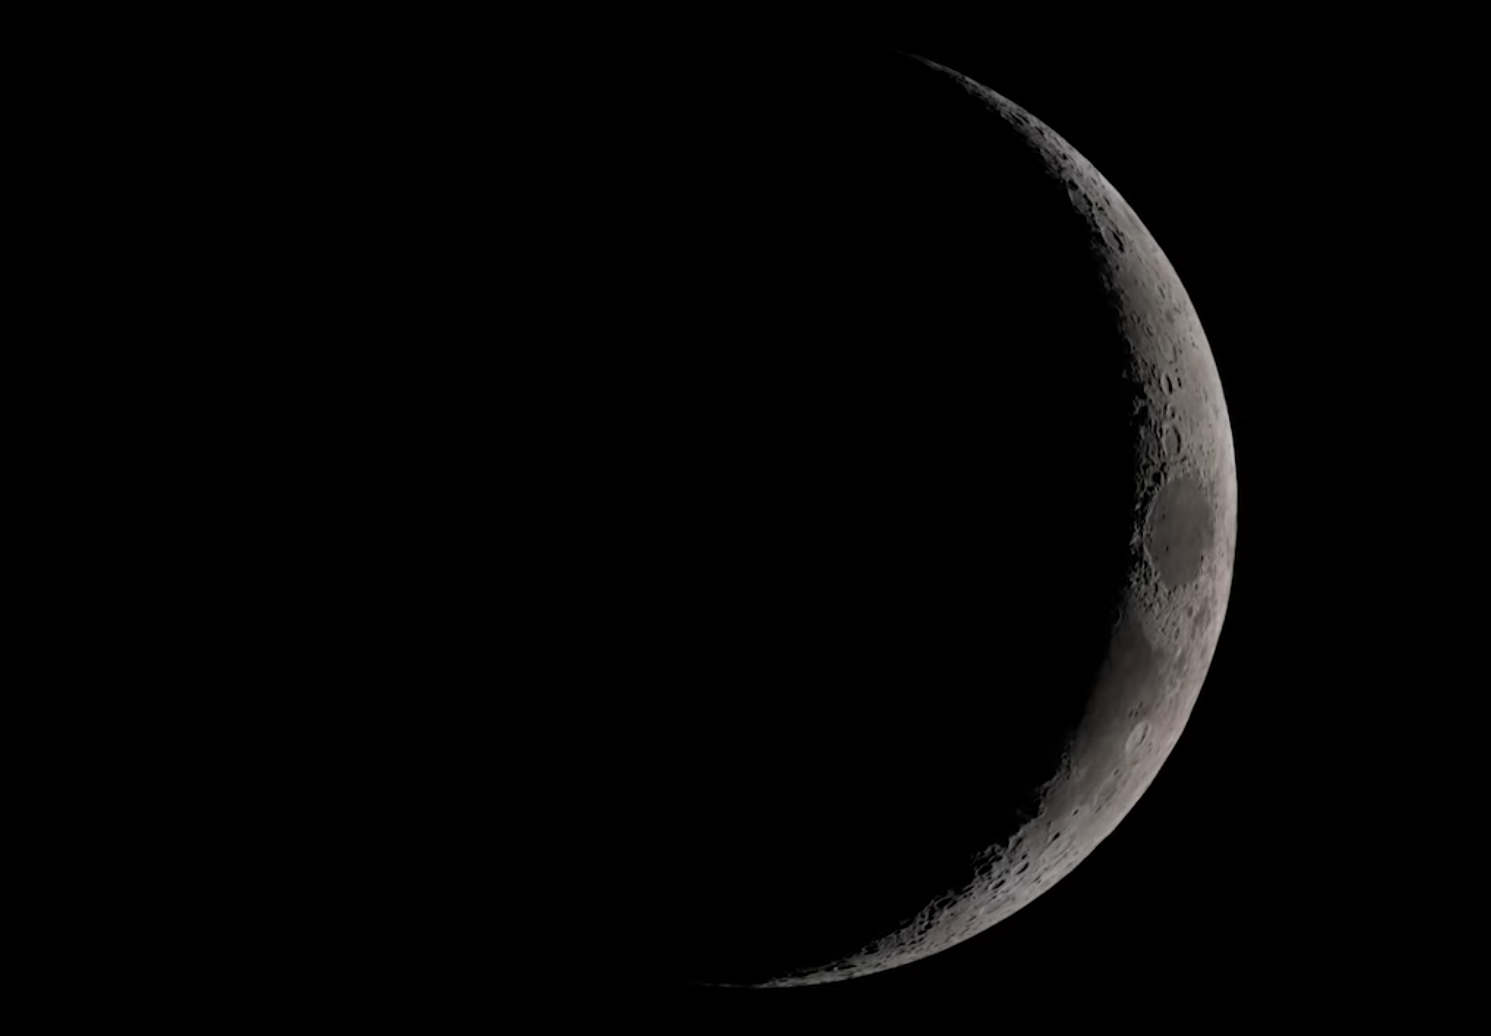 Clair de Lune - Moonlight